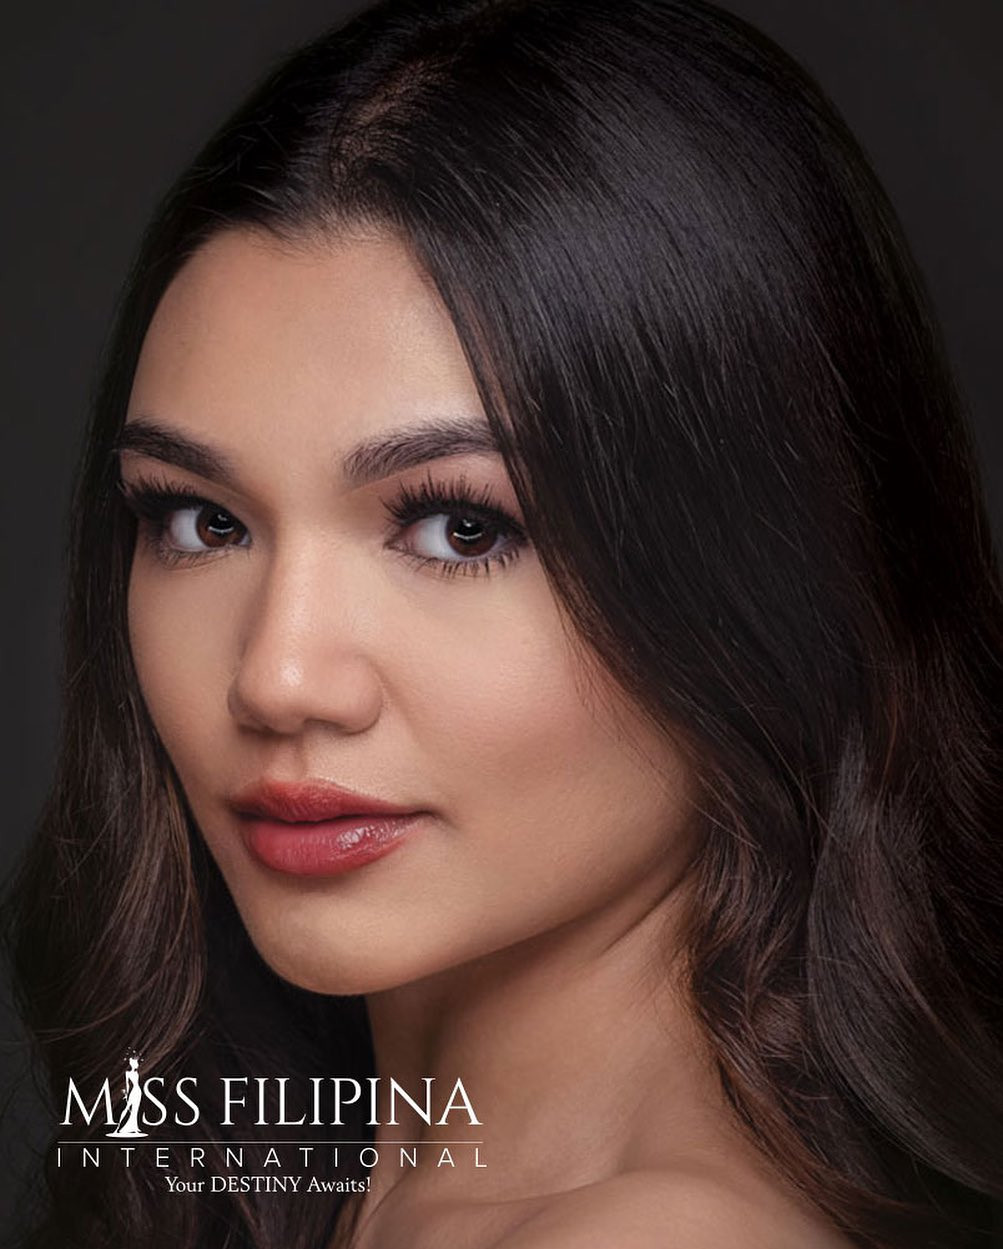 candidatas a miss filipina international 2021. final: 31 july. A5KW4n